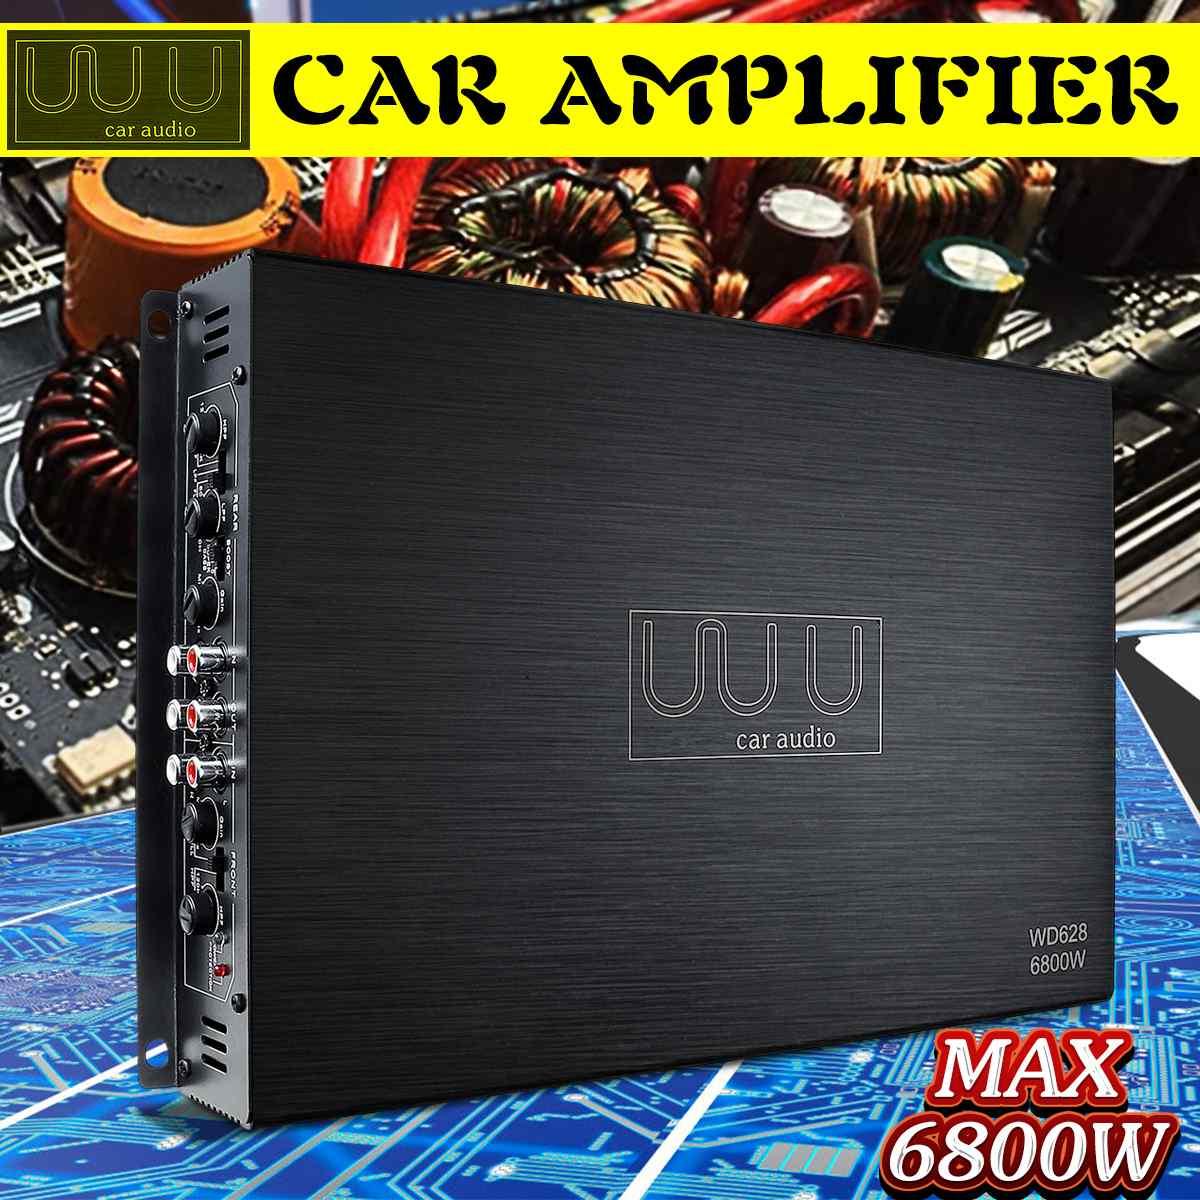 DC 12V 6800W 4 Canal Amplificador De Áudio Estéreo Do Carro Amplificadores De Áudio Amplificadores De Áudio Do Carro Subwoofer Falante de Graves Carro amplificador